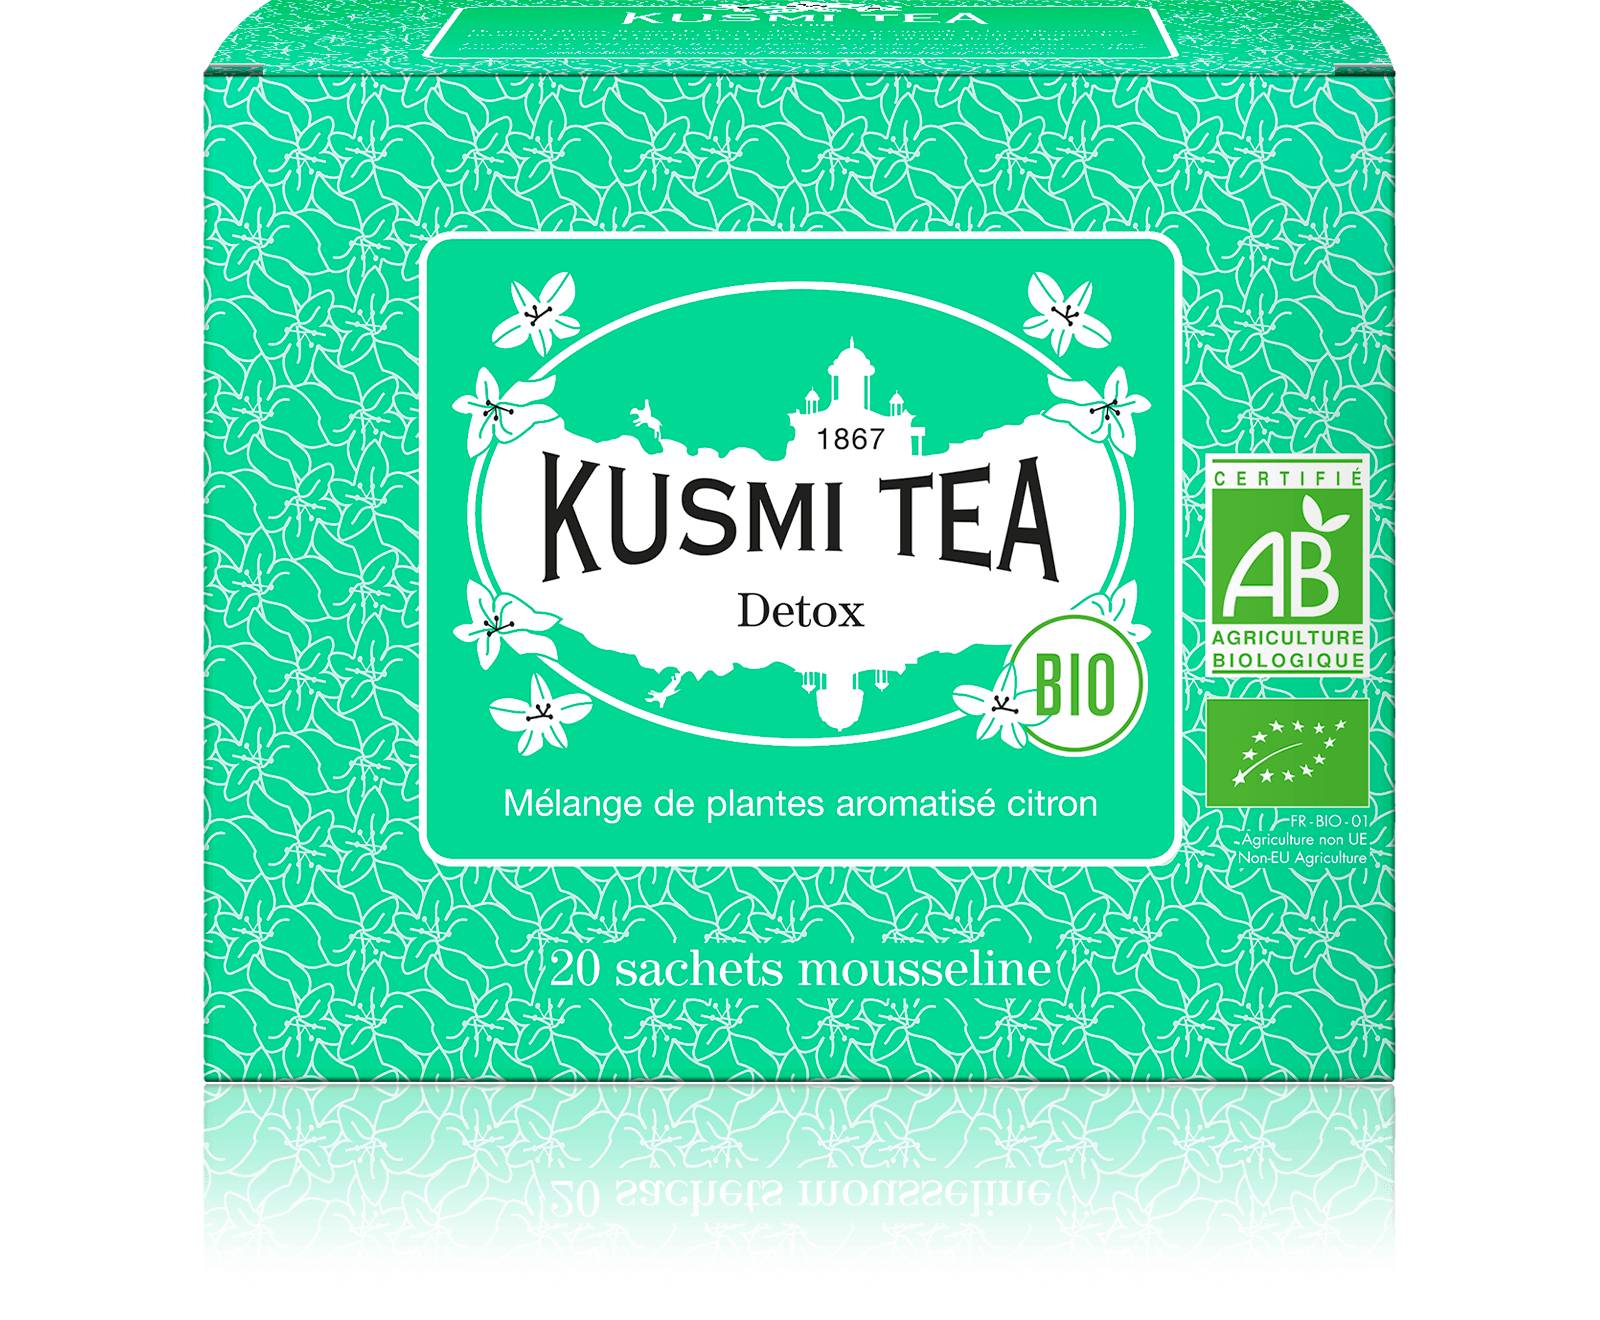 KUSMI TEA Detox bio - Thé vert, maté, citron - Sachets de thé - Kusmi Tea